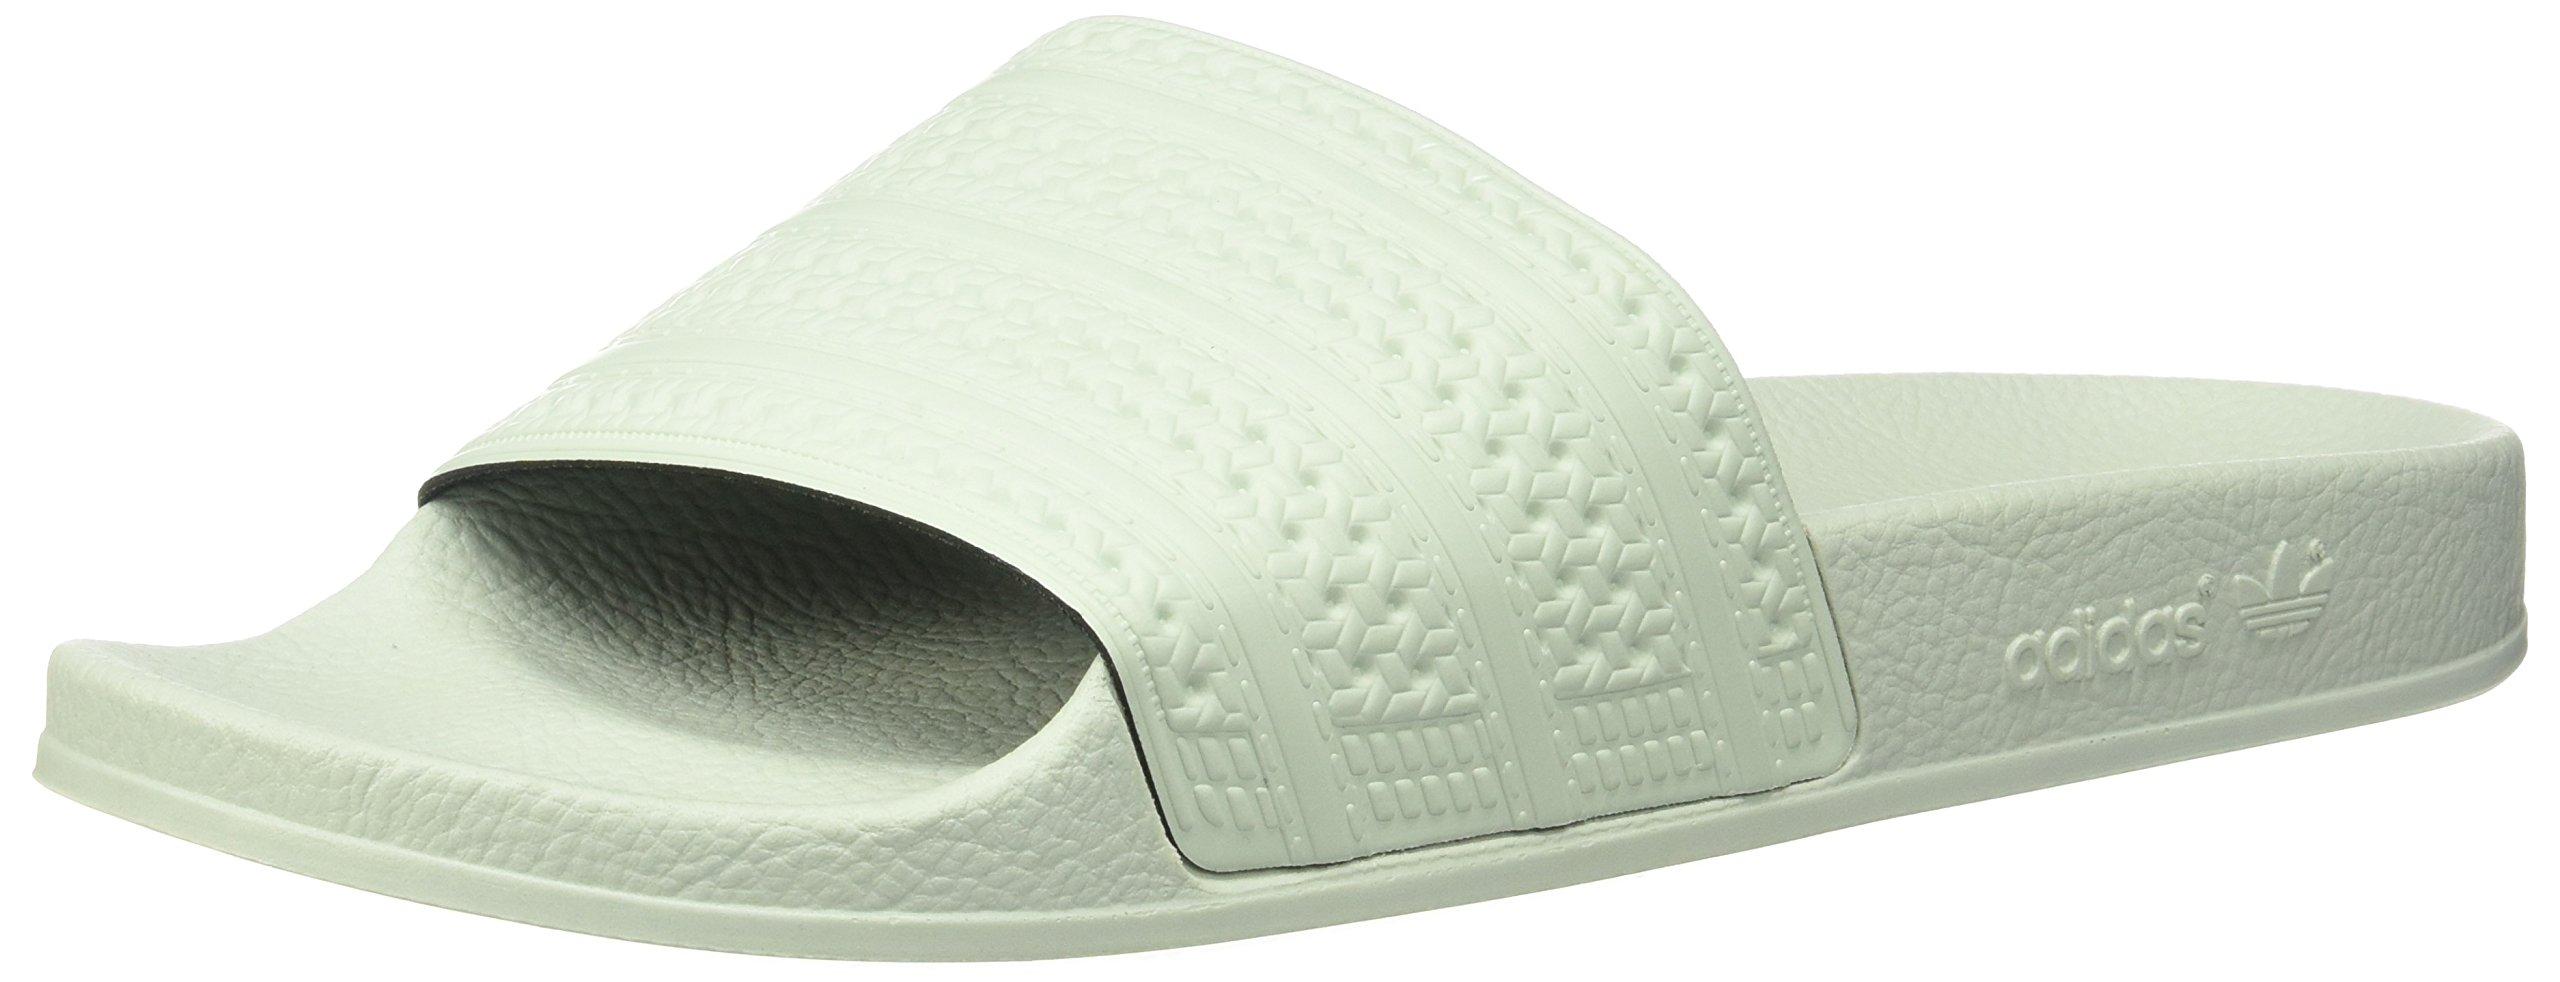 Adidas Men's Adilette,Linen Green,12 M US